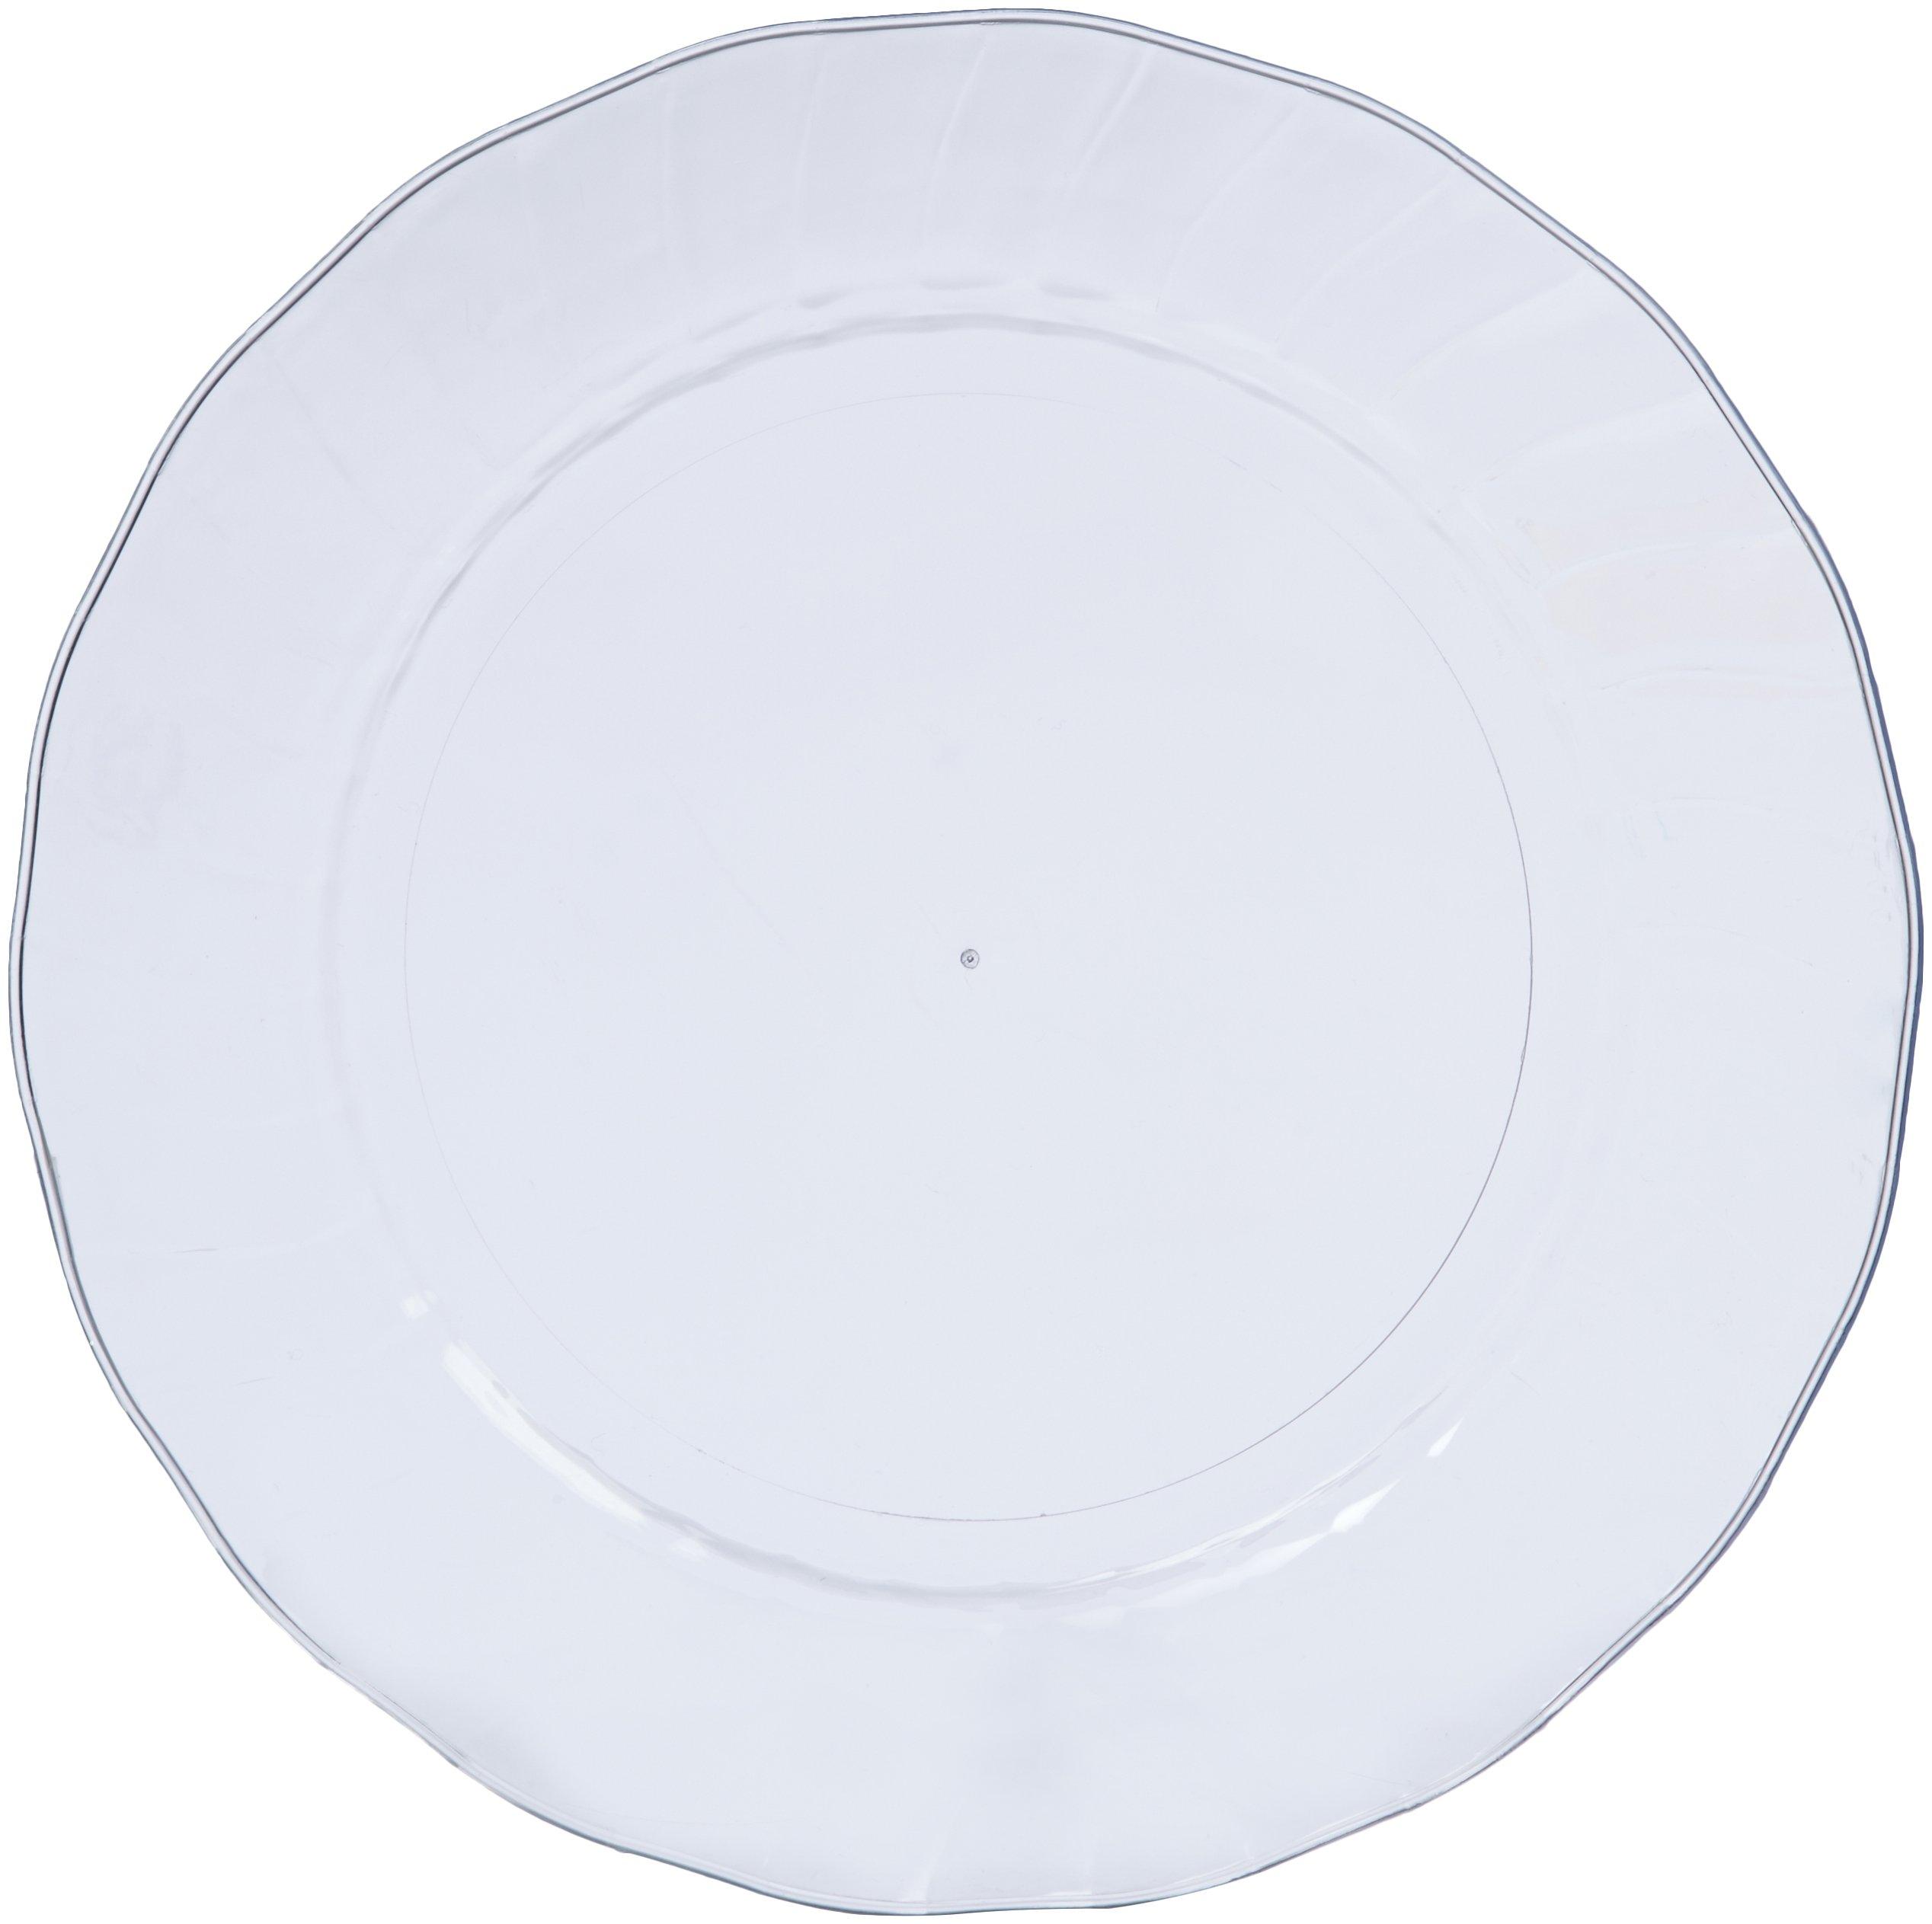 AmazonBasics Disposable Plastic Plates - 100-Pack, 7.5-inch by AmazonBasics (Image #2)